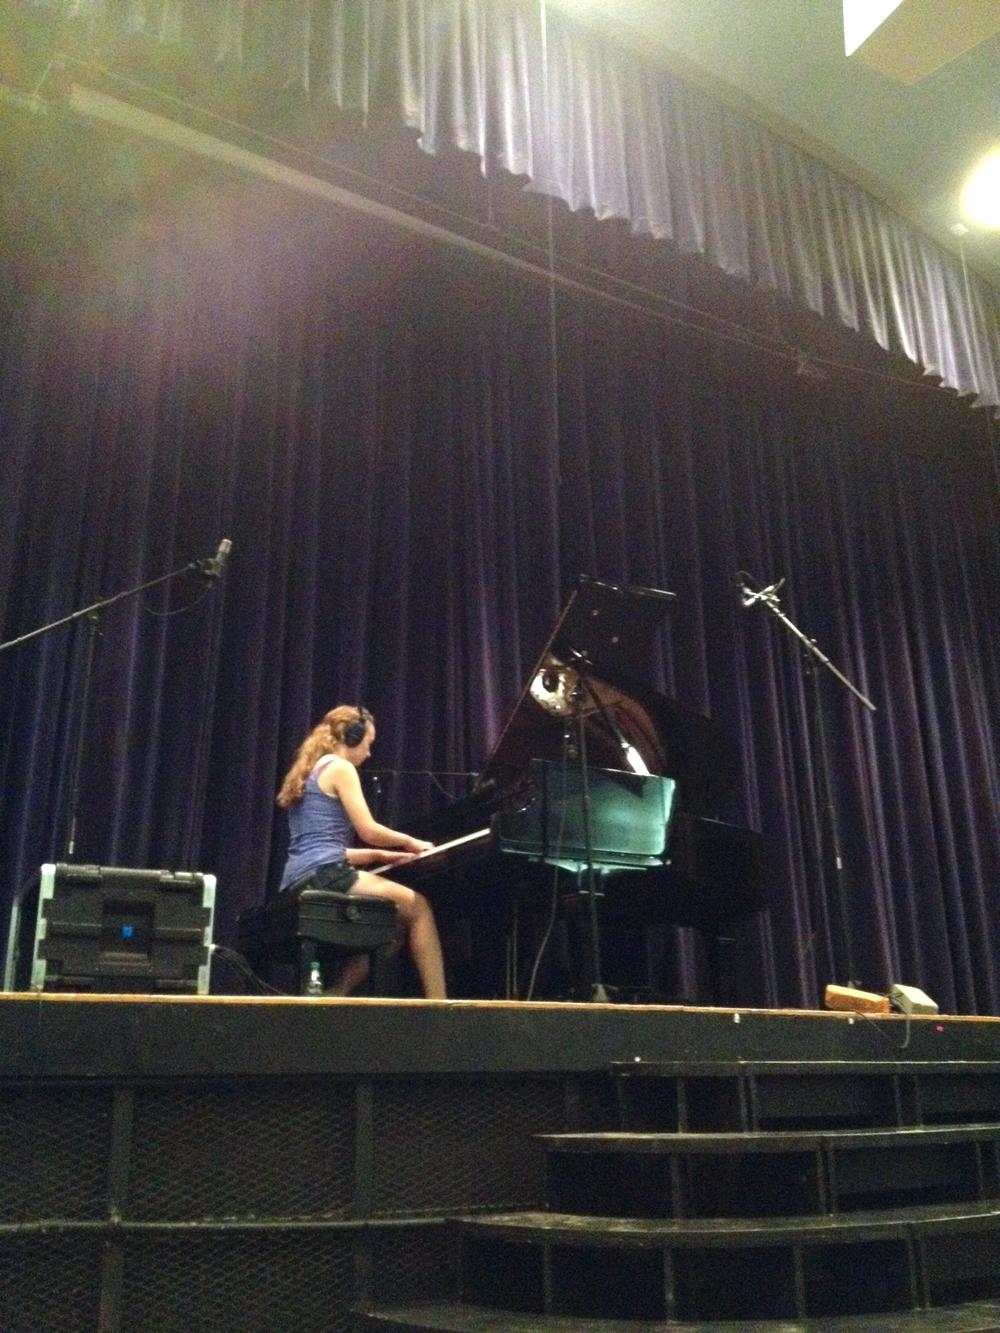 Megan Widger records five original piano pieces with Tone Tree Audio in Kearney, Nebraska in late summer 2014 at Kearney High School Auditorium.